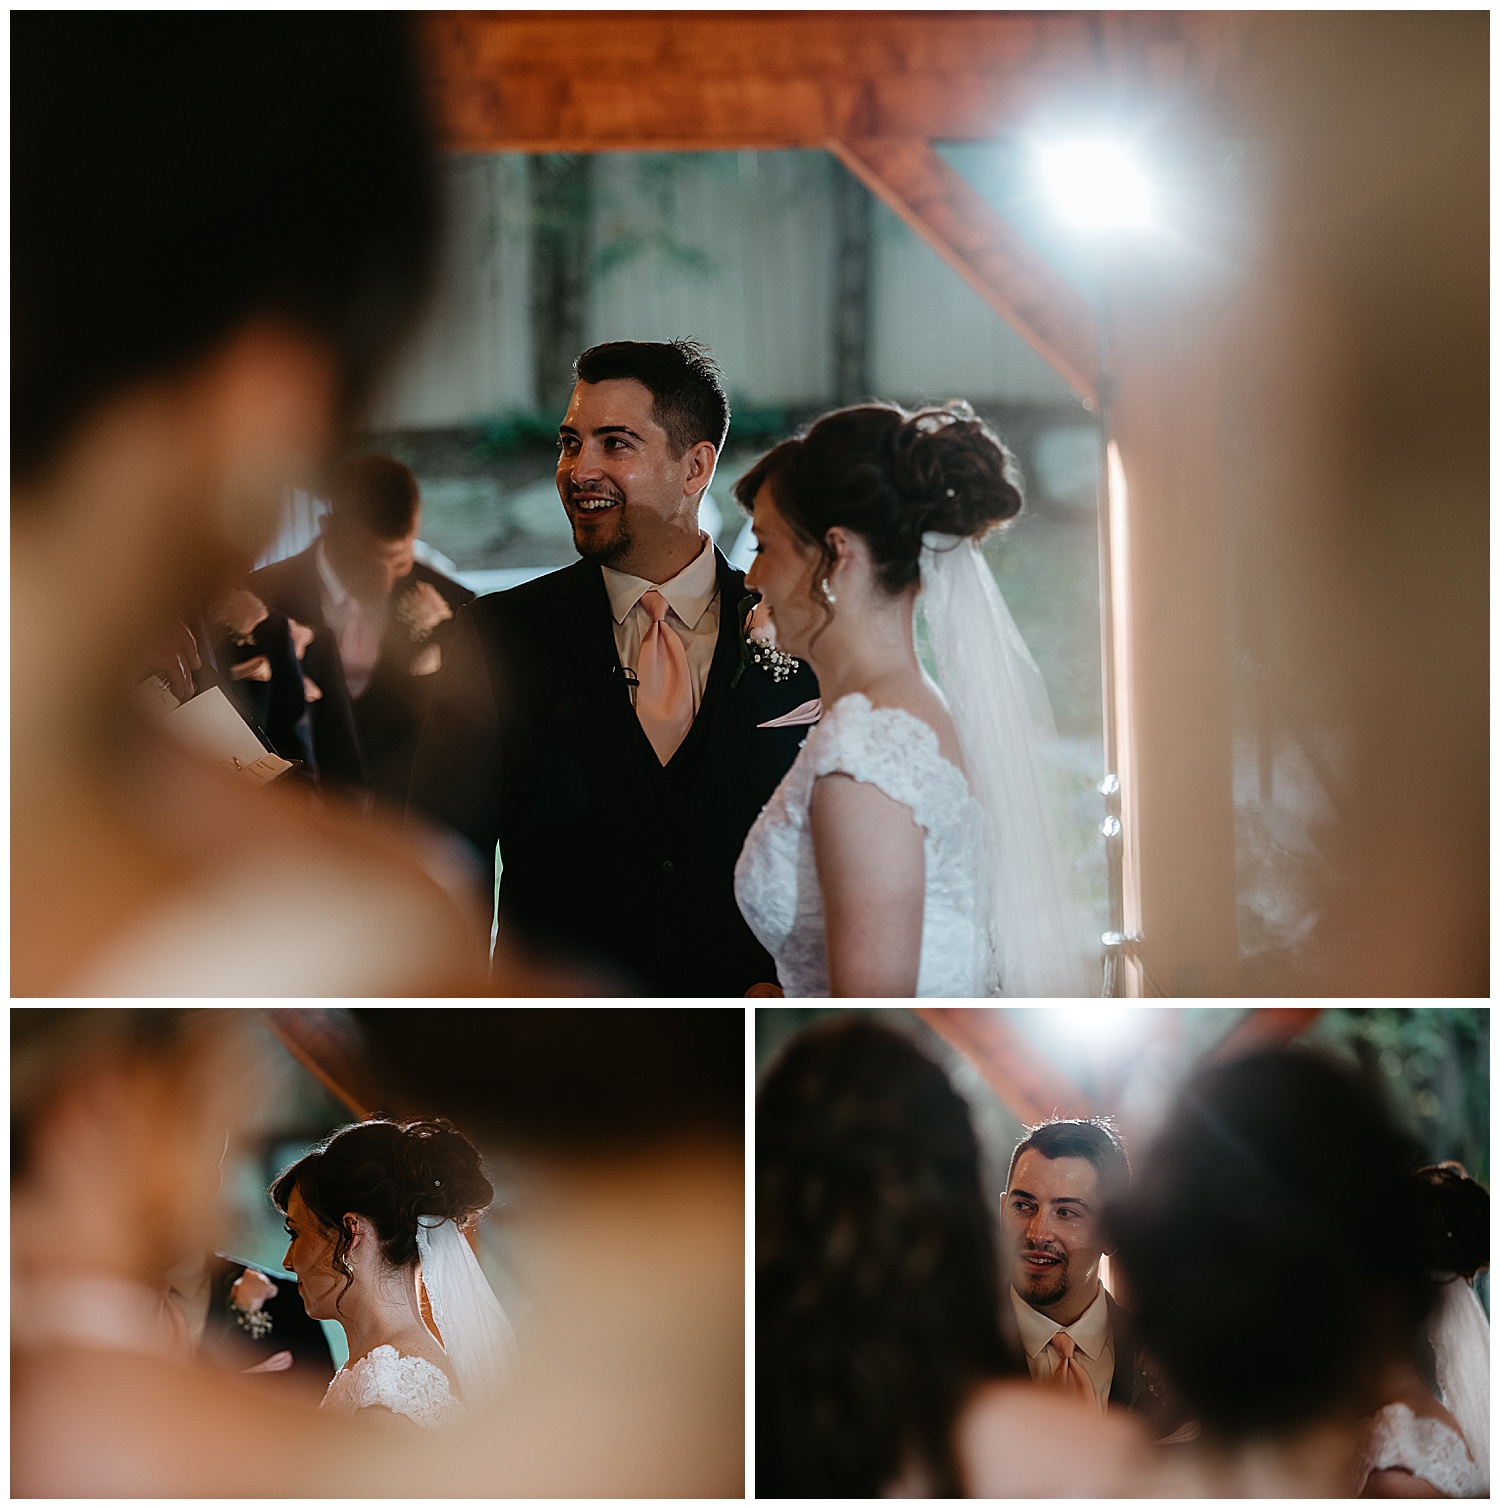 NEPA-Mount-Pocono-Wedding-Photographer-at-the-Stroudsmoor-Country-Inn-Stroudsburg-PA_0030.jpg